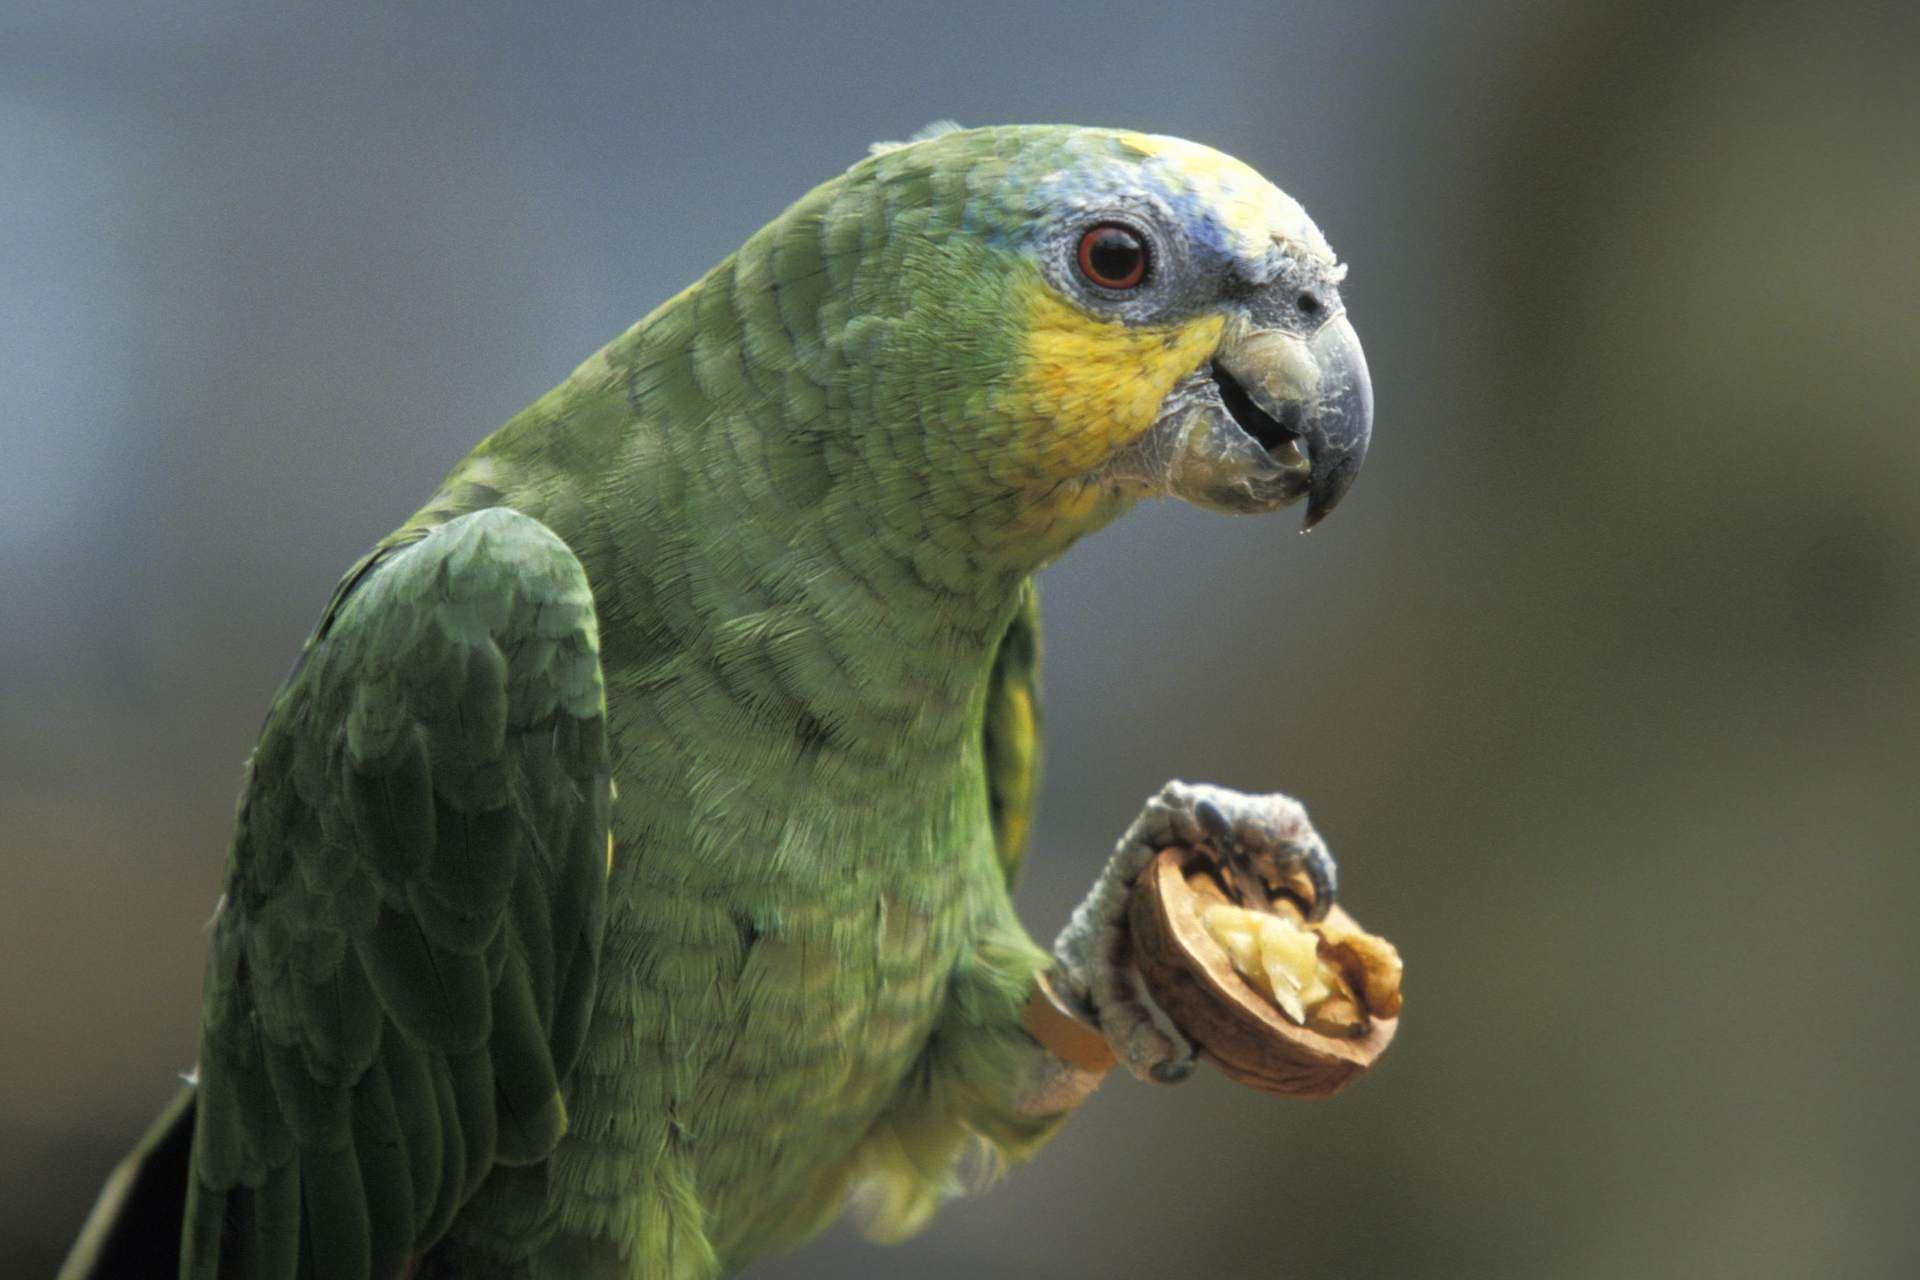 5 Types Of Pet Birds That Talk Parrot Types Of Pet Birds Pet Birds